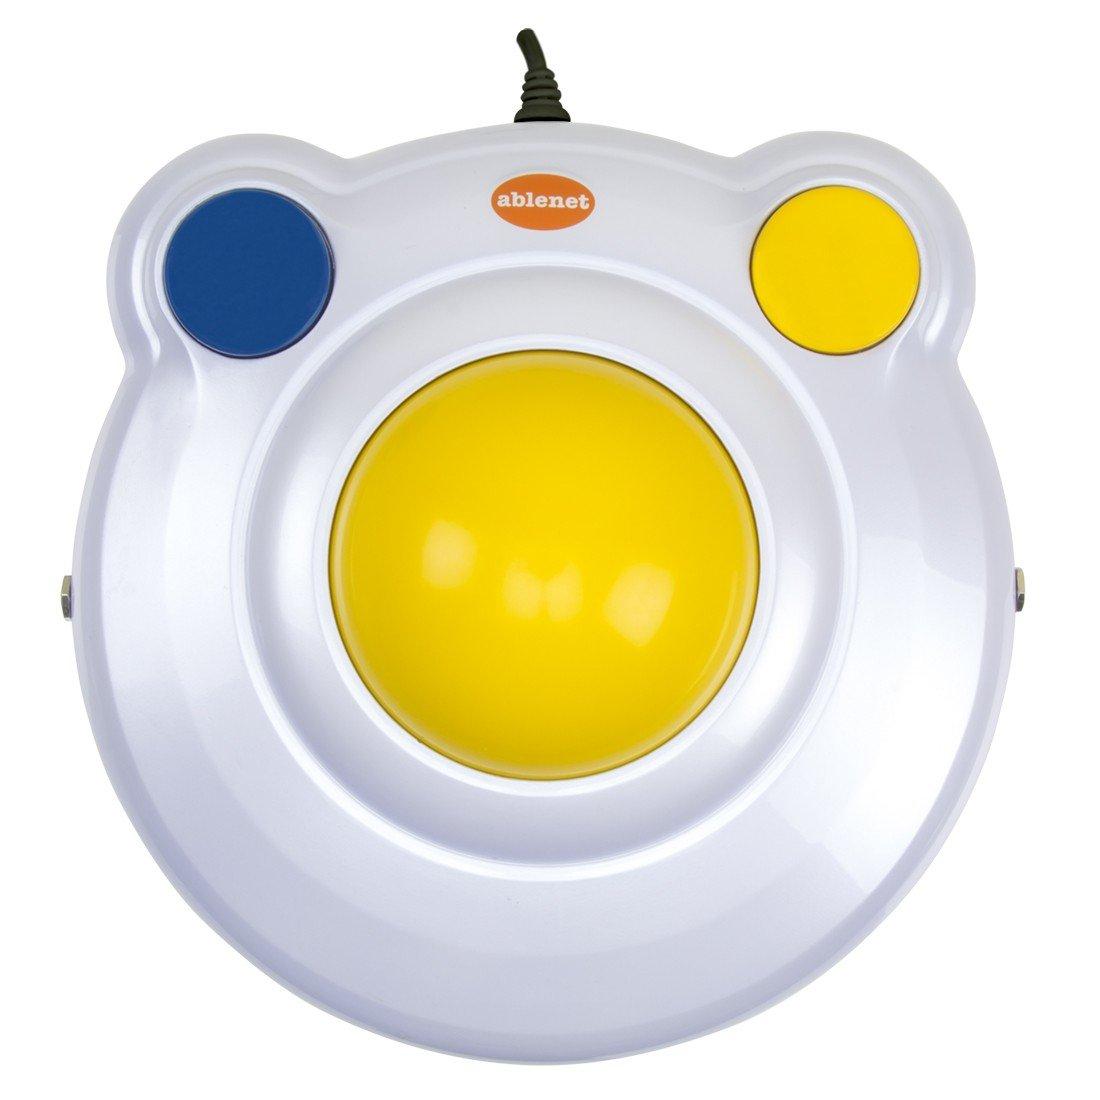 BIGtrack Trackball